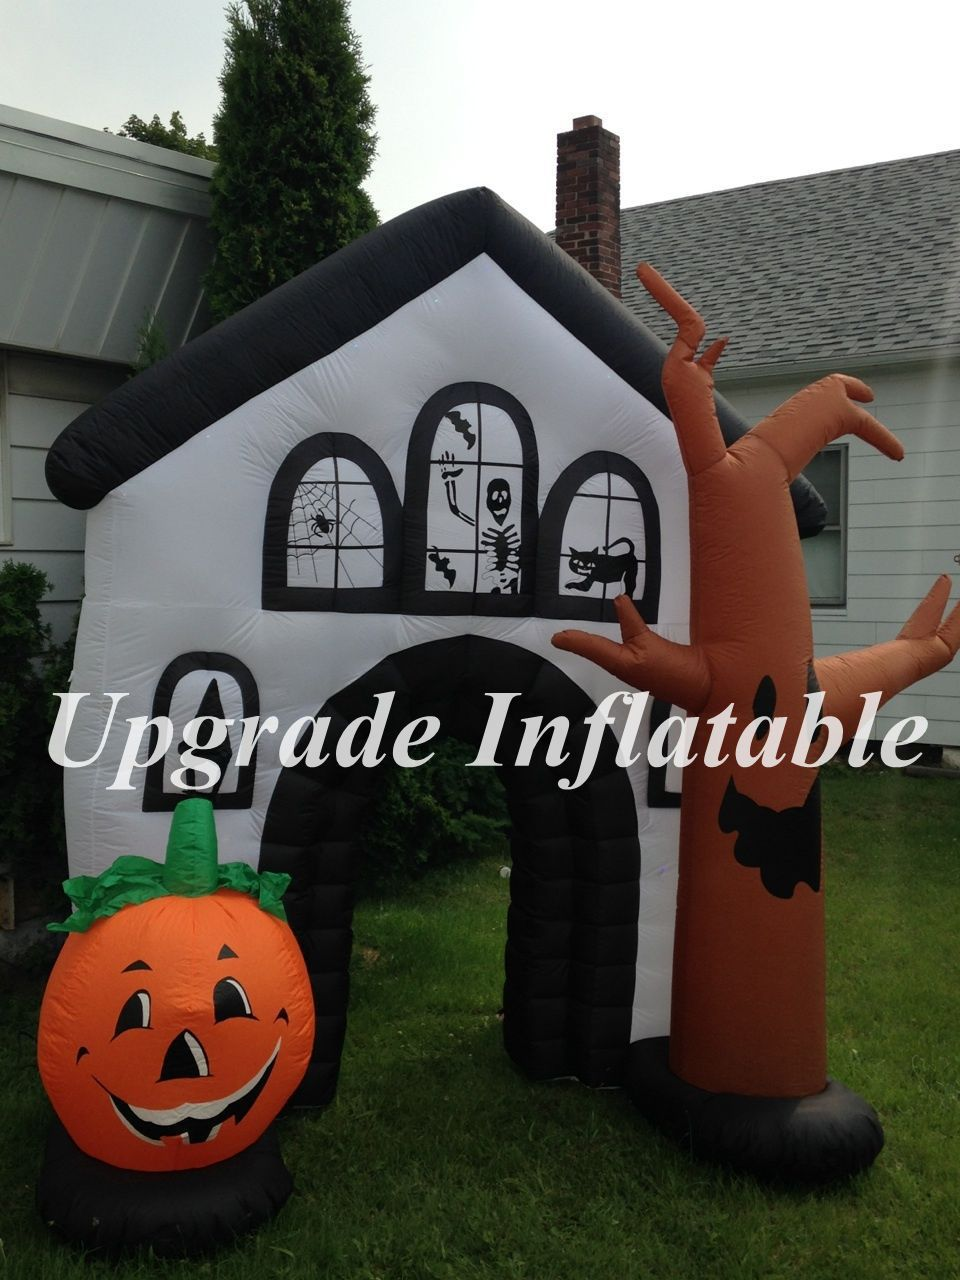 Outdoor inflatable halloween decorations - Horrible Haunted House Entrance Inflatable Outdoor Halloween Decorations China Mainland